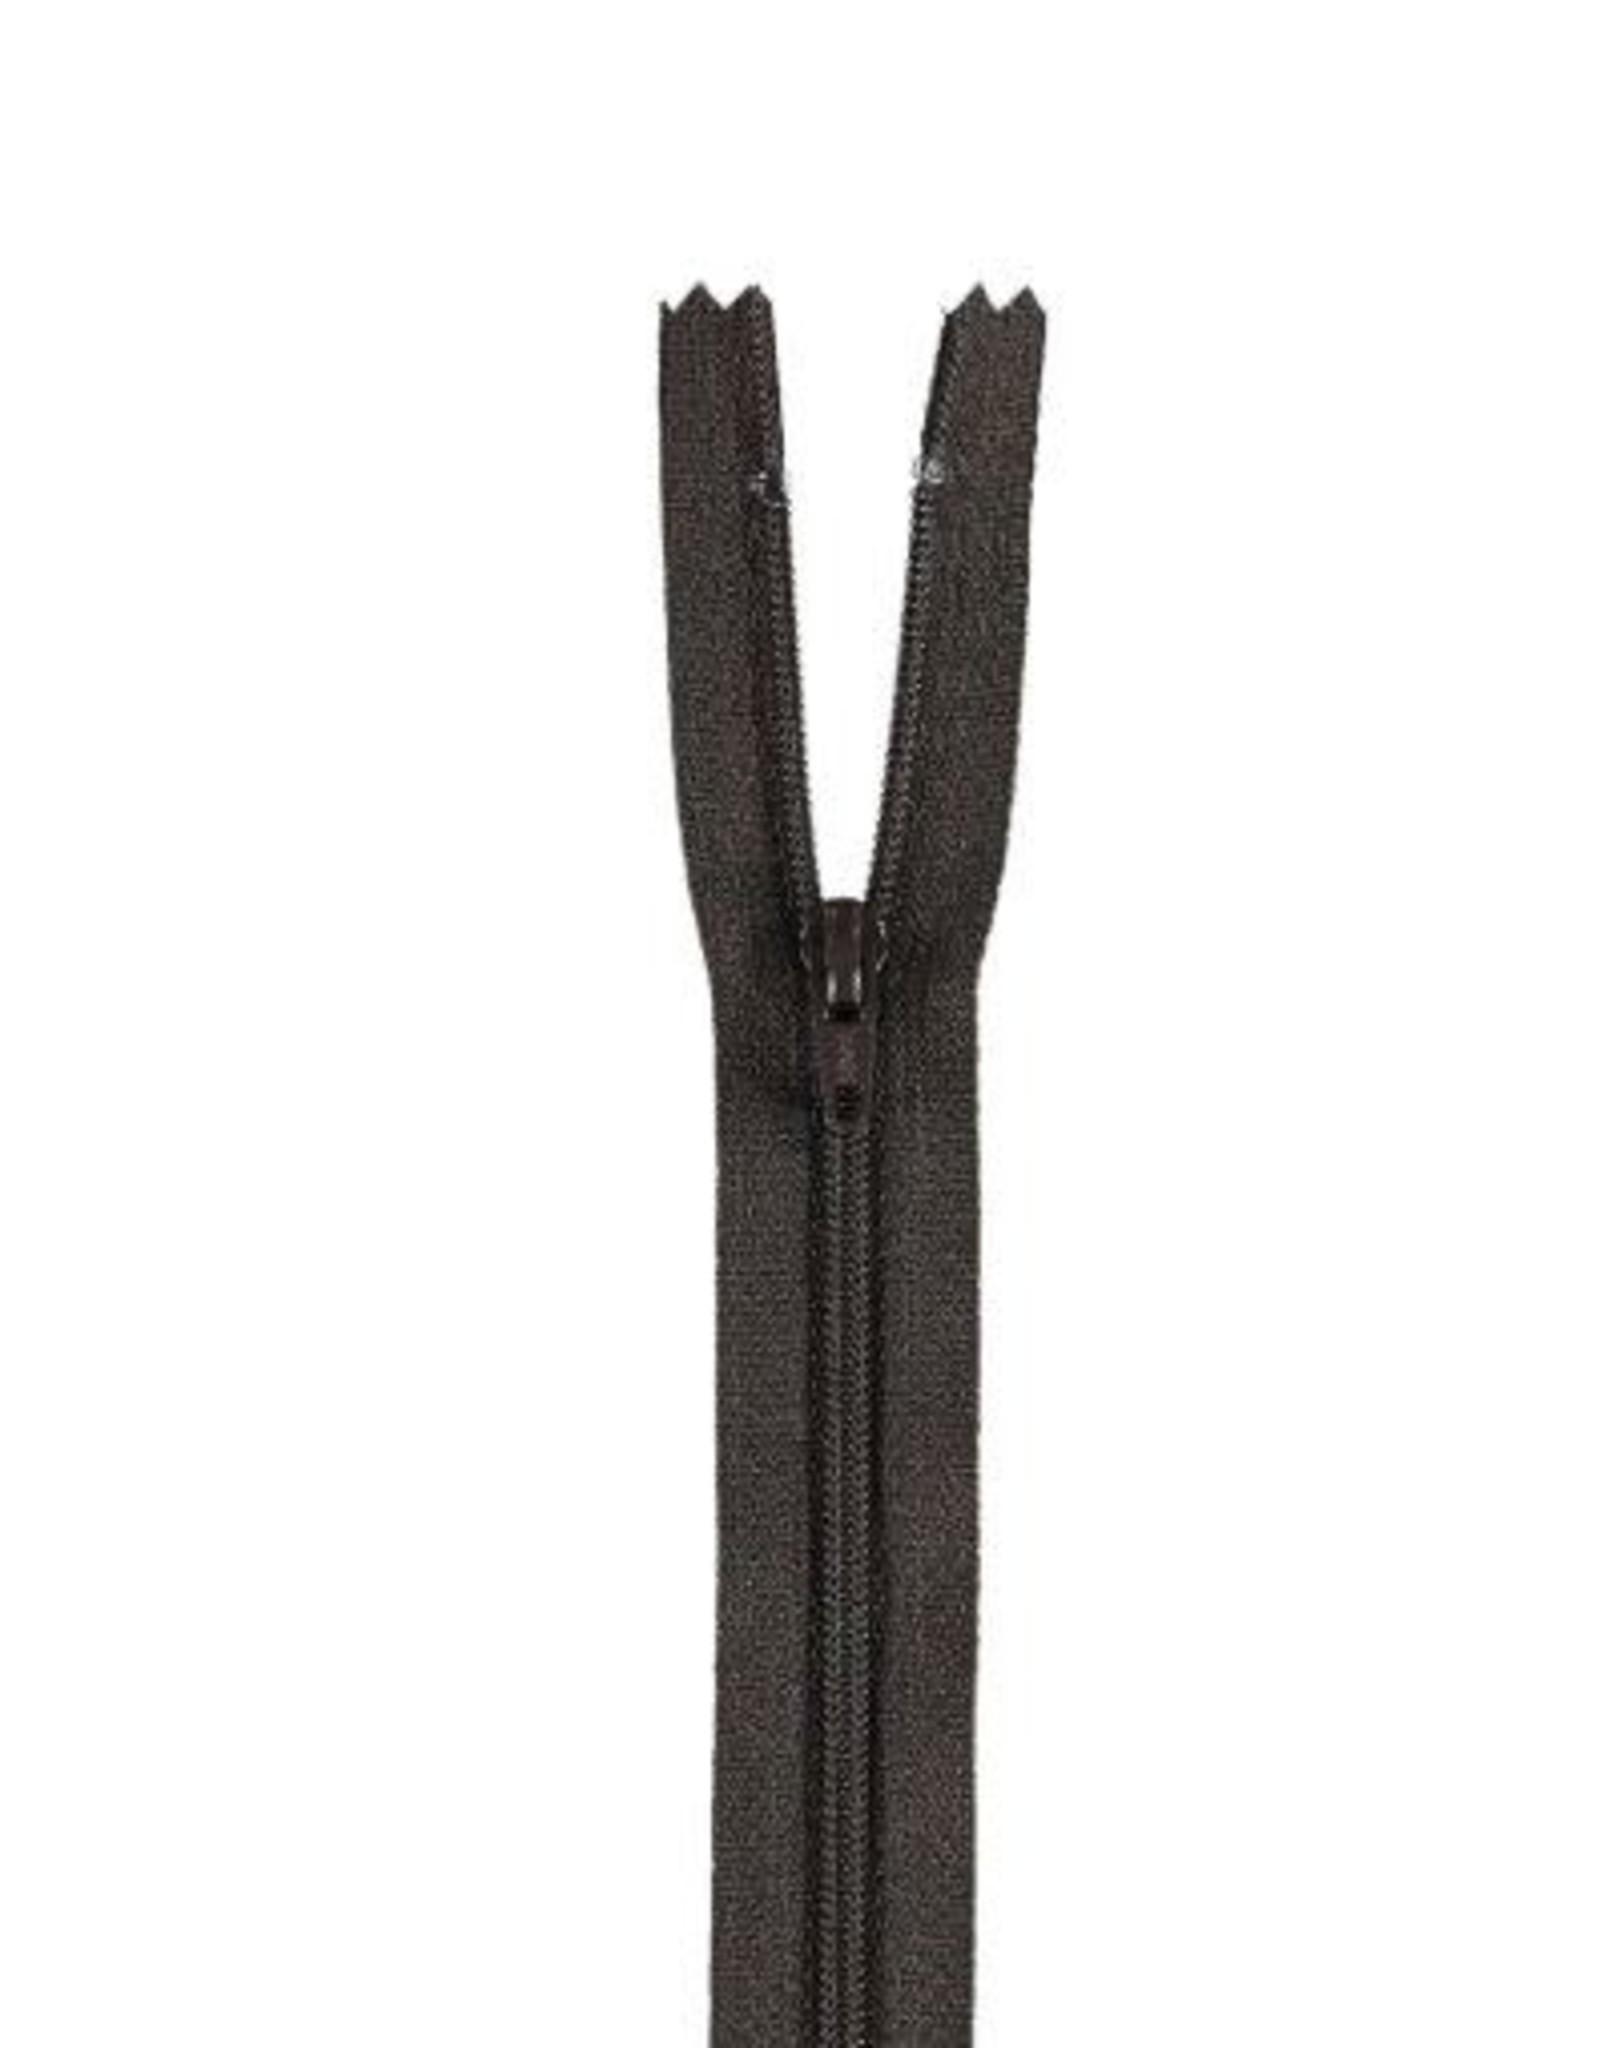 YKK Spiraalrits niet-DB 3mm zwart bruin 916-35cm